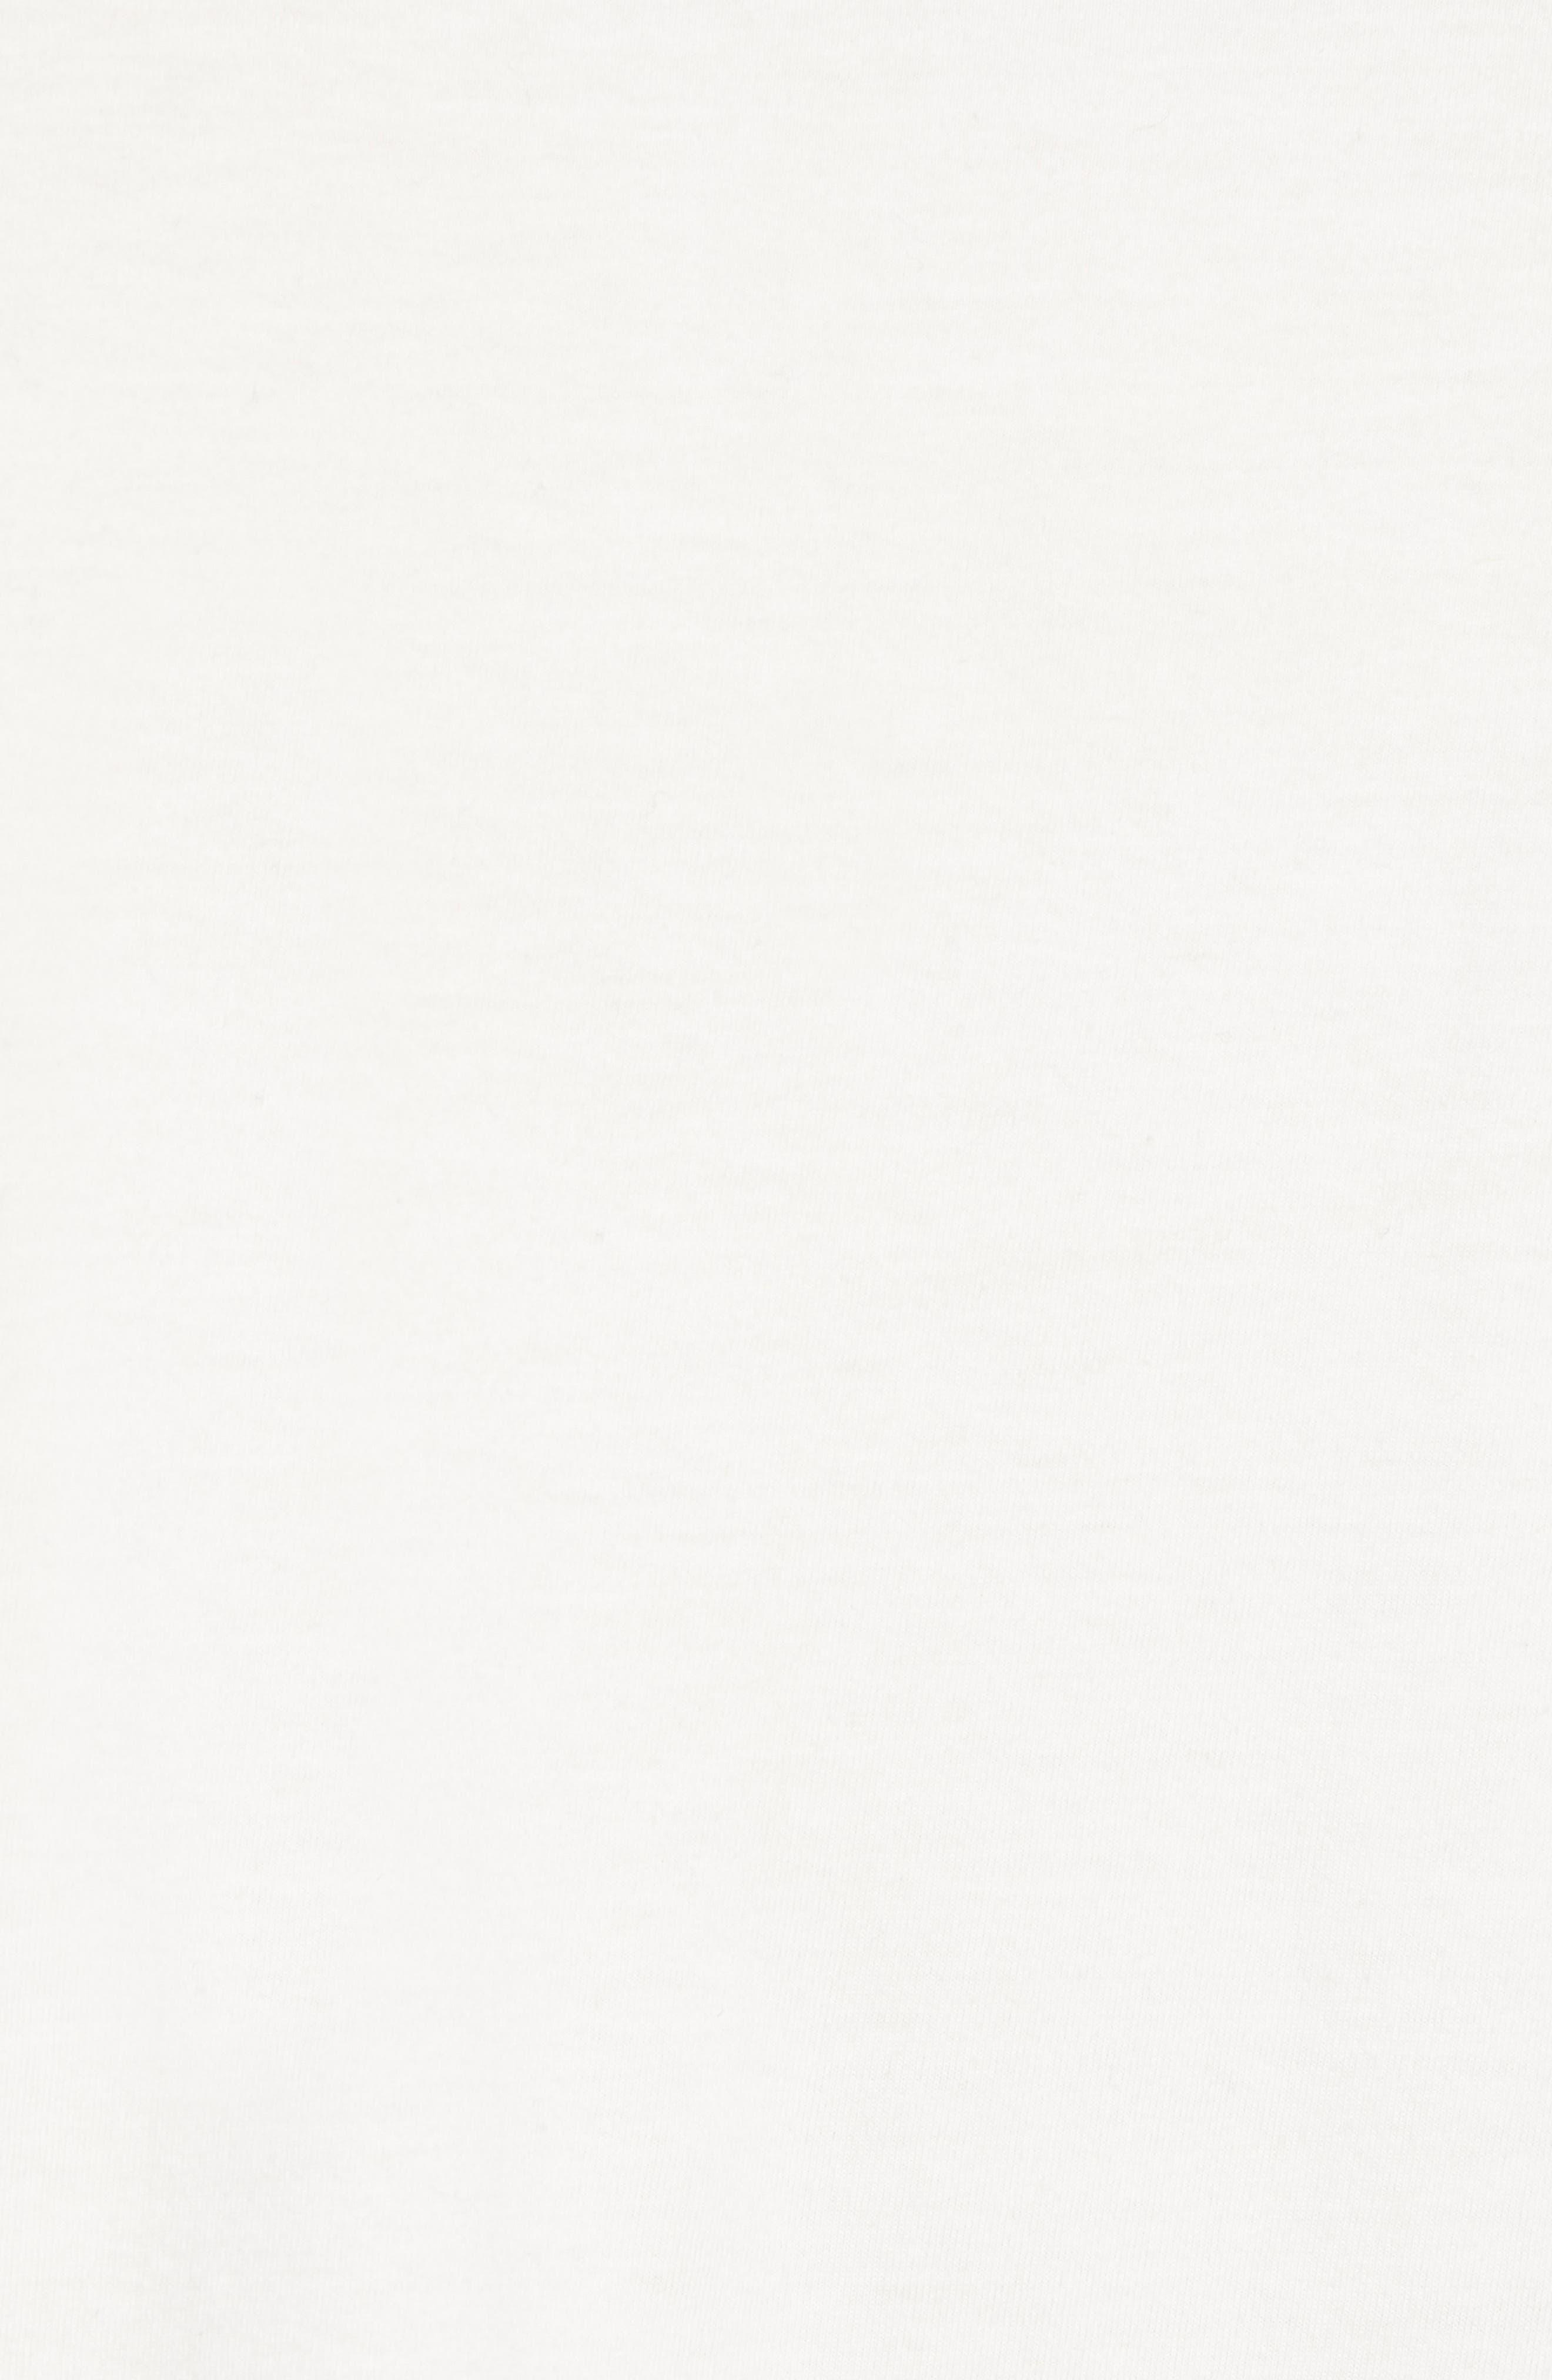 Asymmetrical Colorblock Pocket T-Shirt,                             Alternate thumbnail 5, color,                             CUBA WHITE UTILITY BLUE